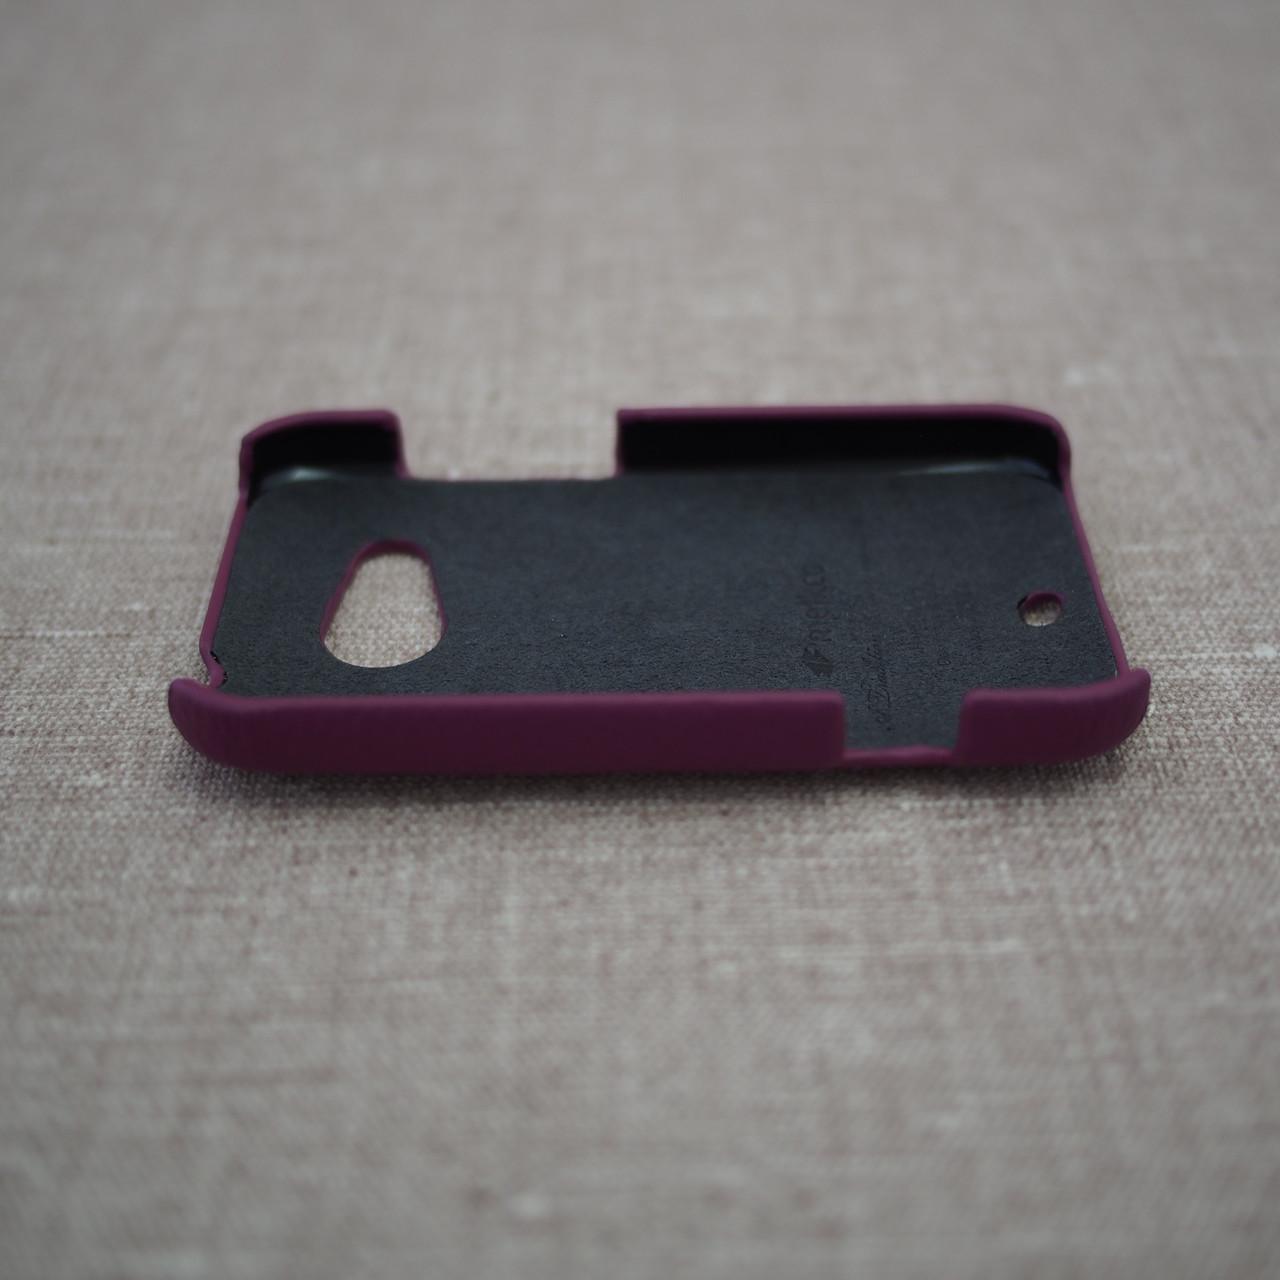 Melkco Snap Cover HTC Desire 200 purple